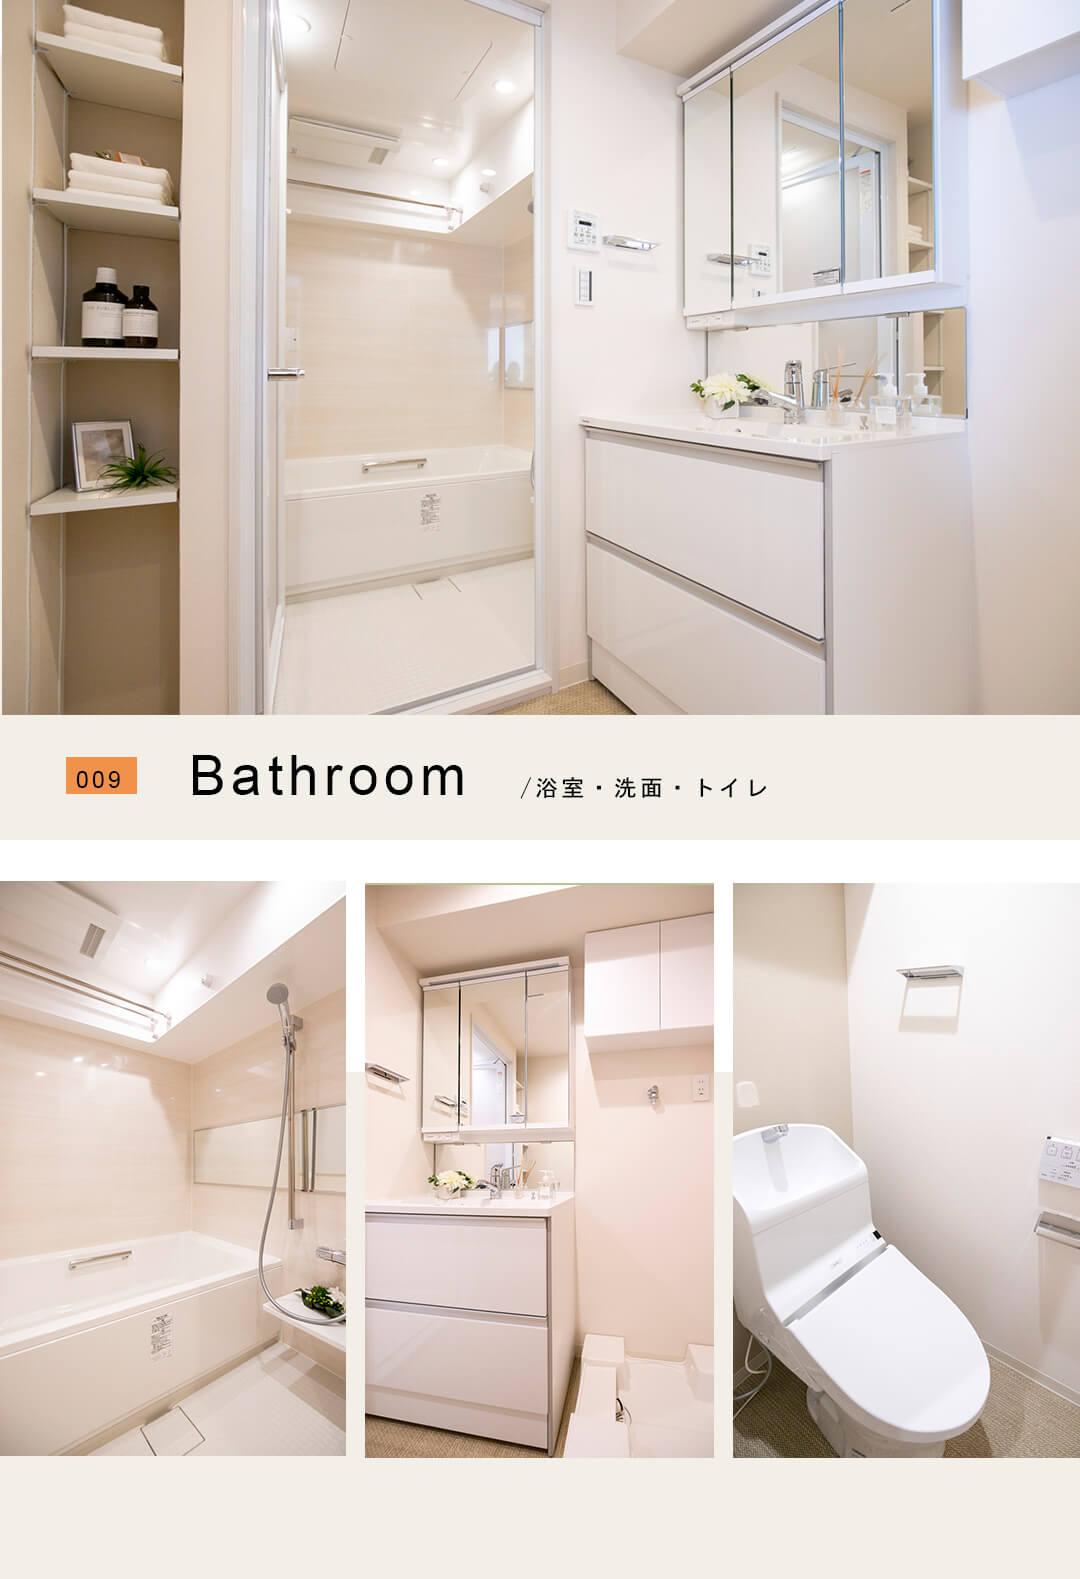 009,Bathroom,浴室,洗面.トイレ